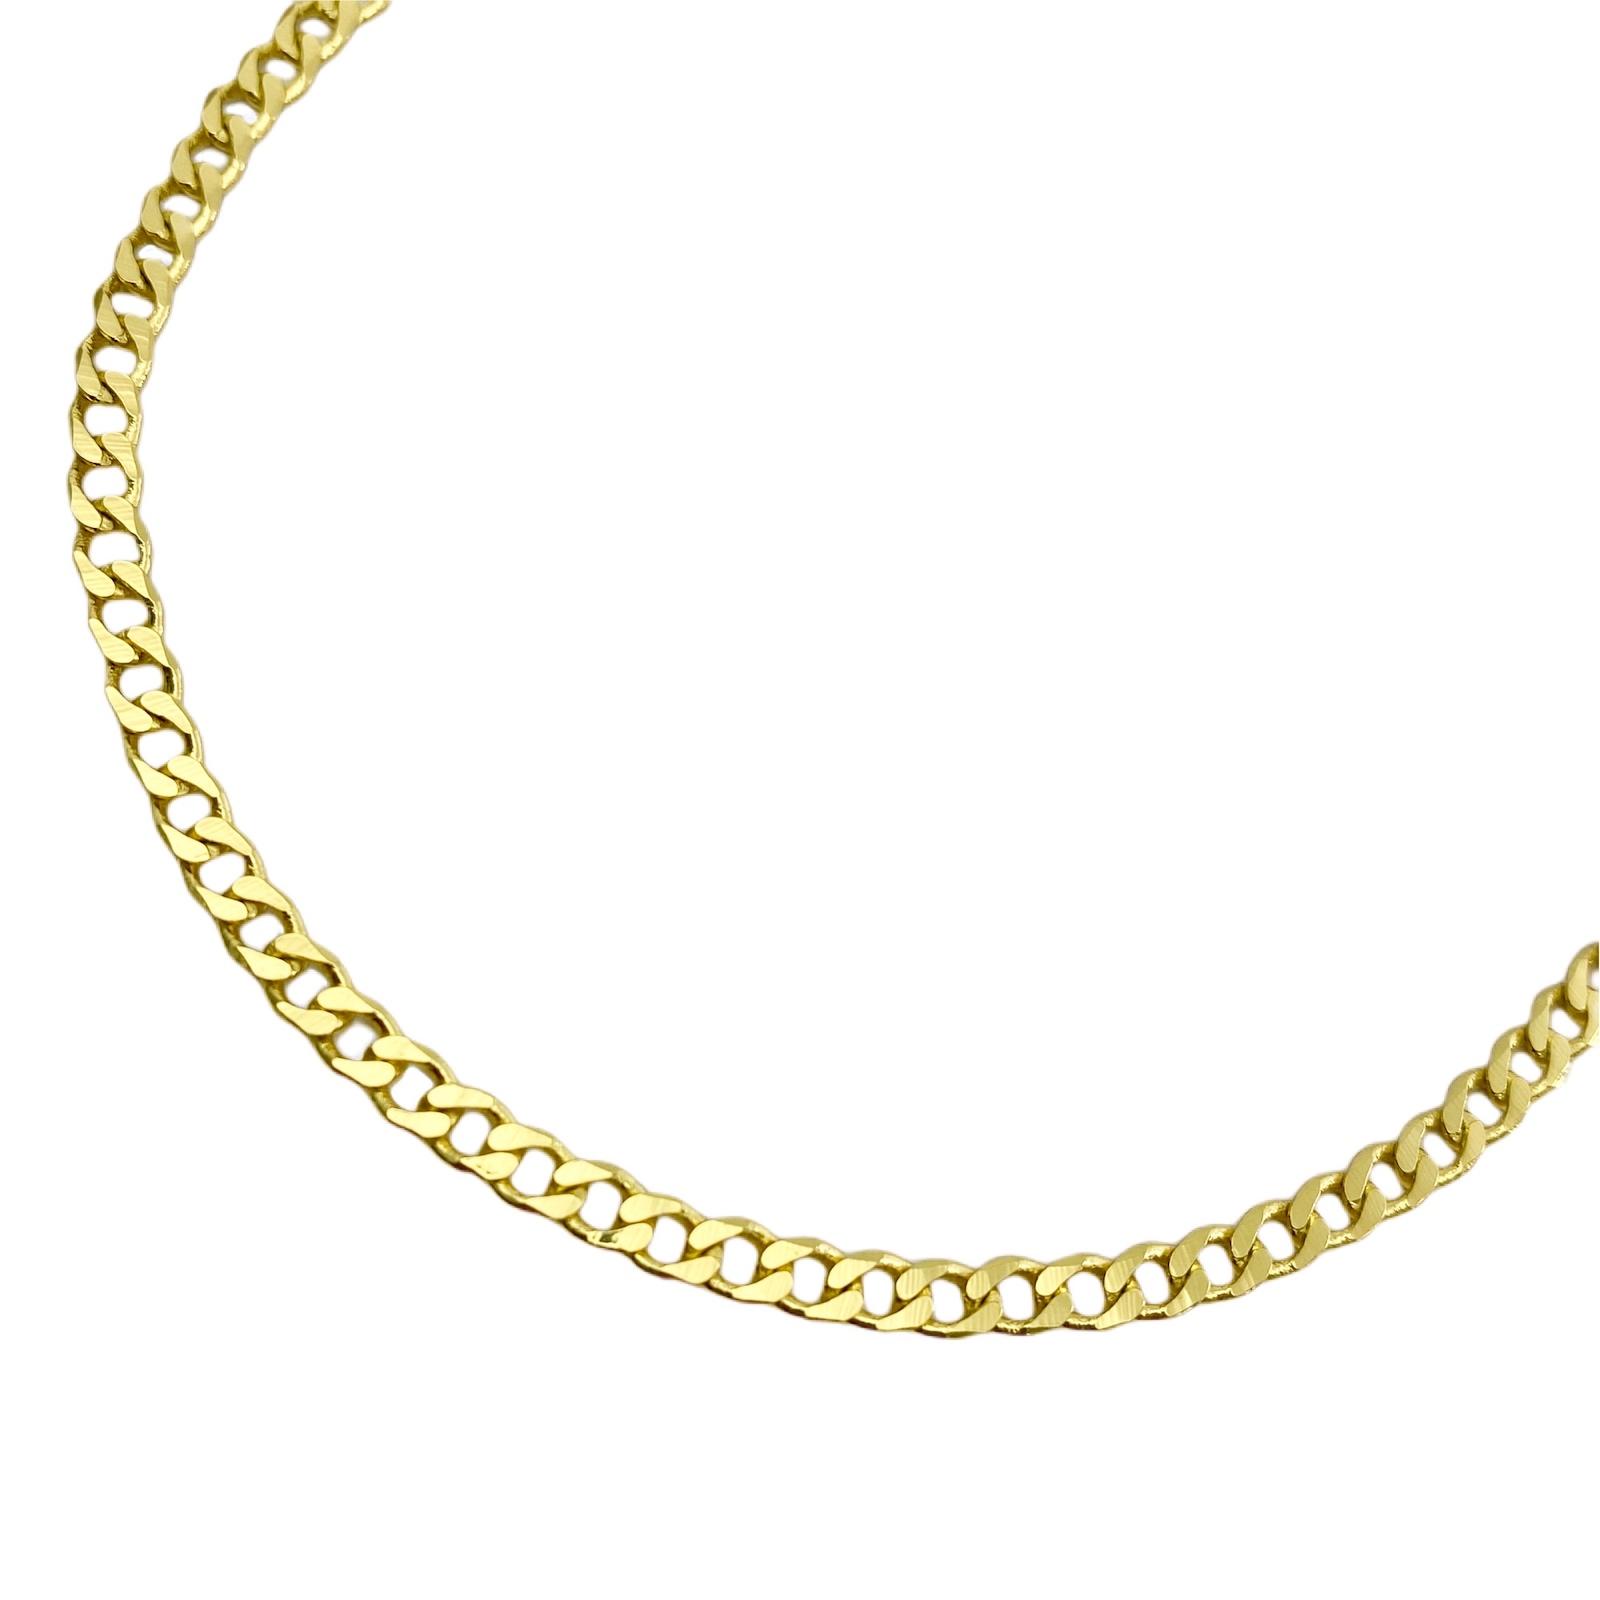 Corrente Grumet 3,2mm 60cm (10g) (Fecho Gaveta) (Banho Ouro 24k)